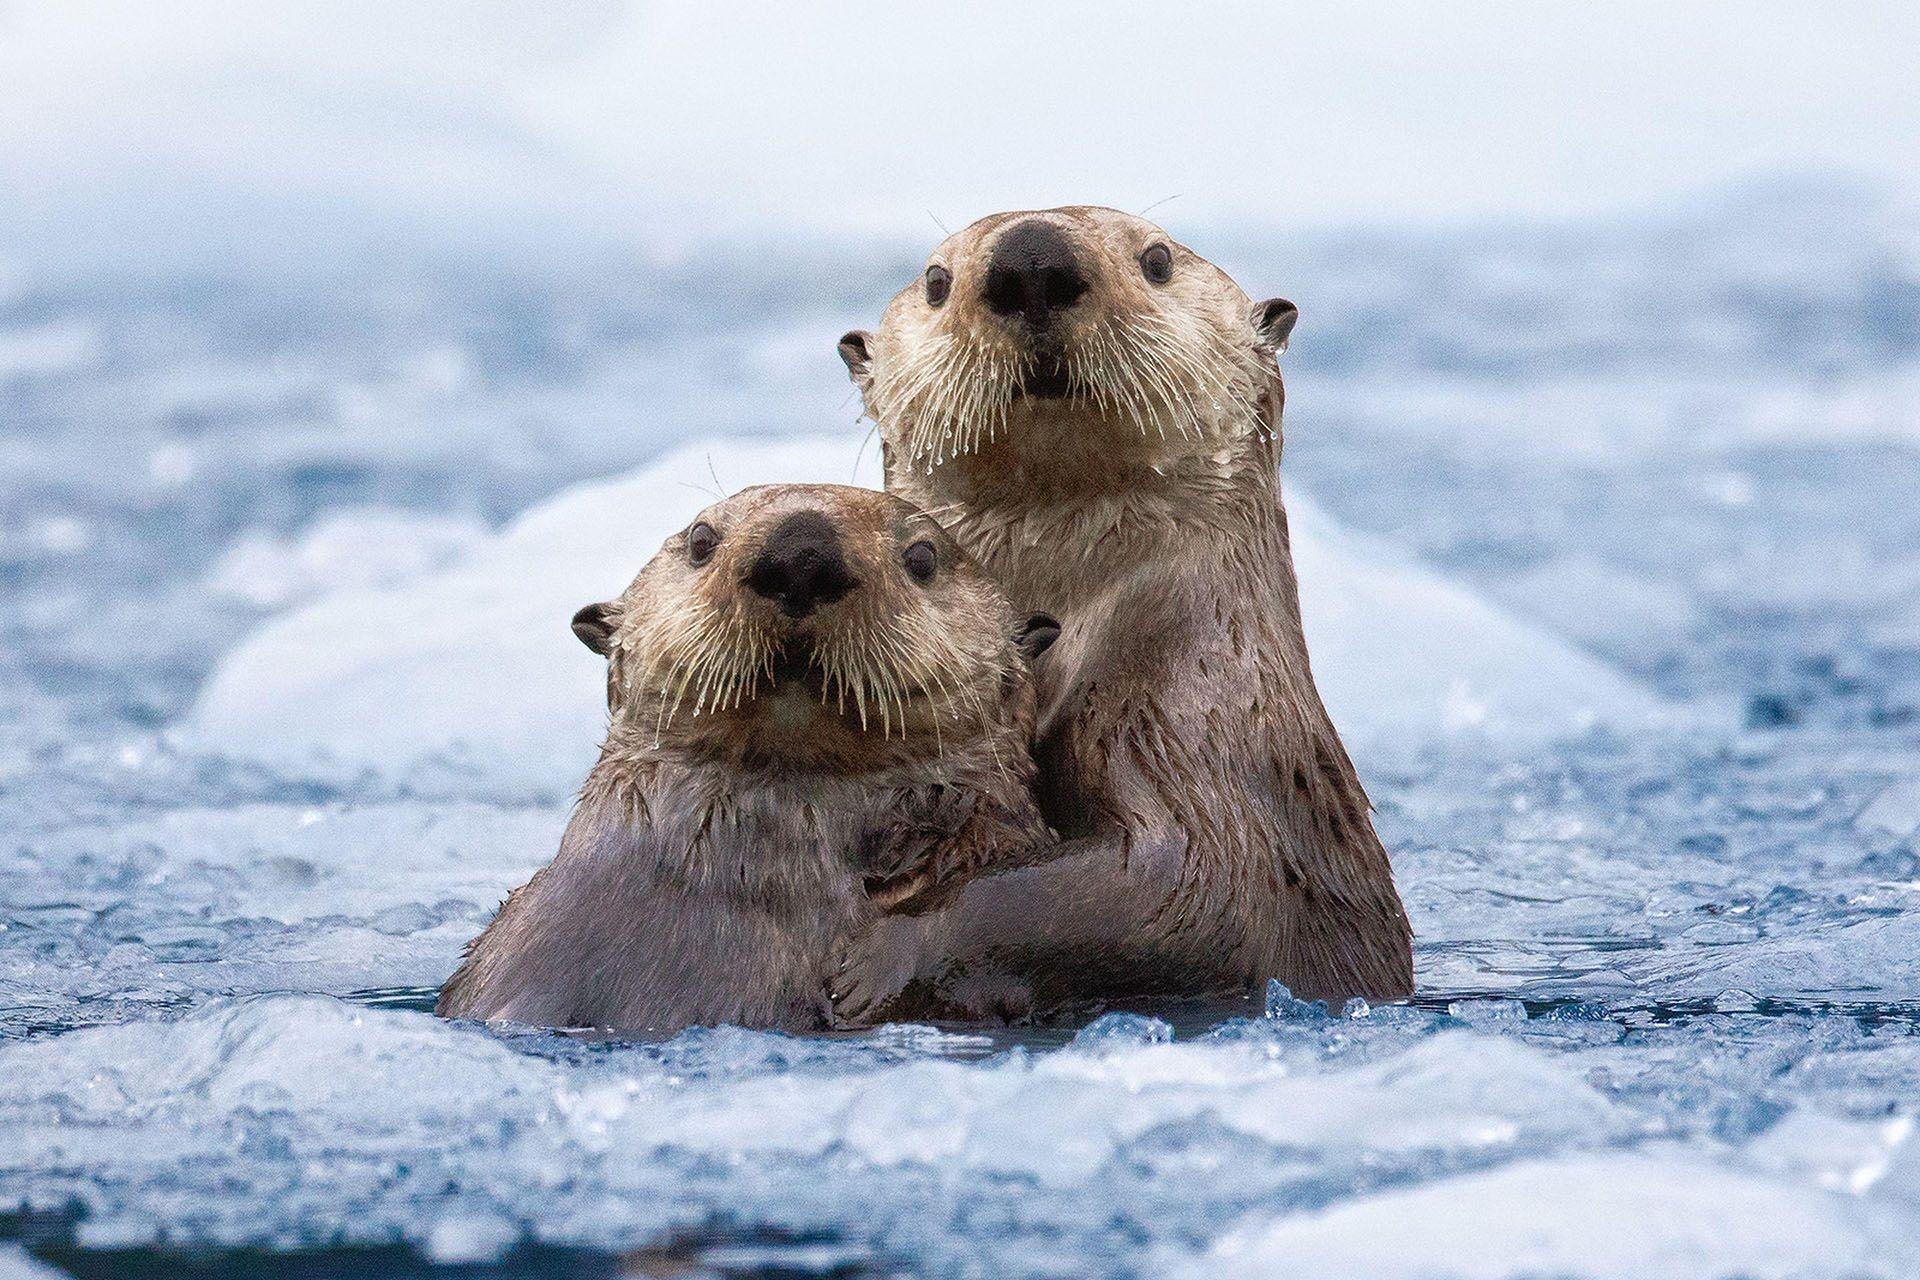 Photograph by Roman Golubenko, National Geographic